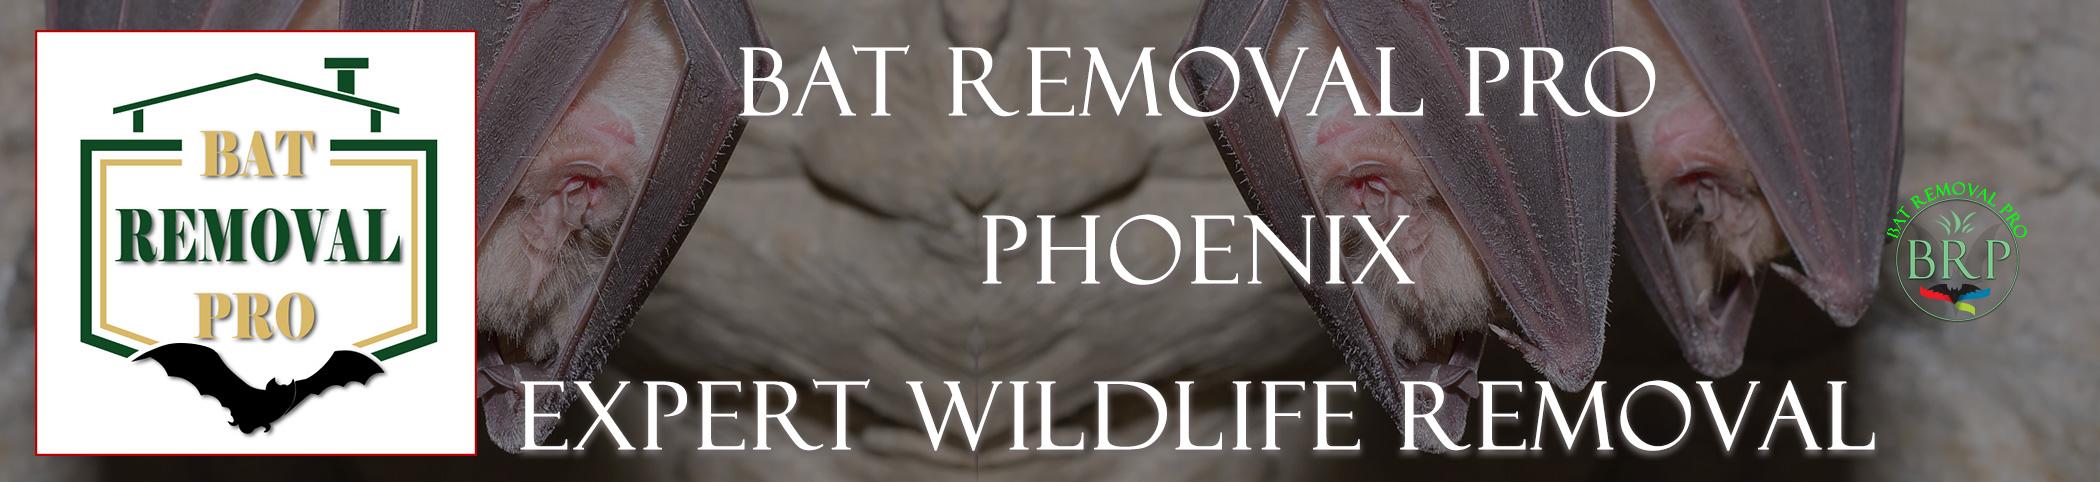 Phoenix_arizona_HEADER_IMAGE bat removal pro